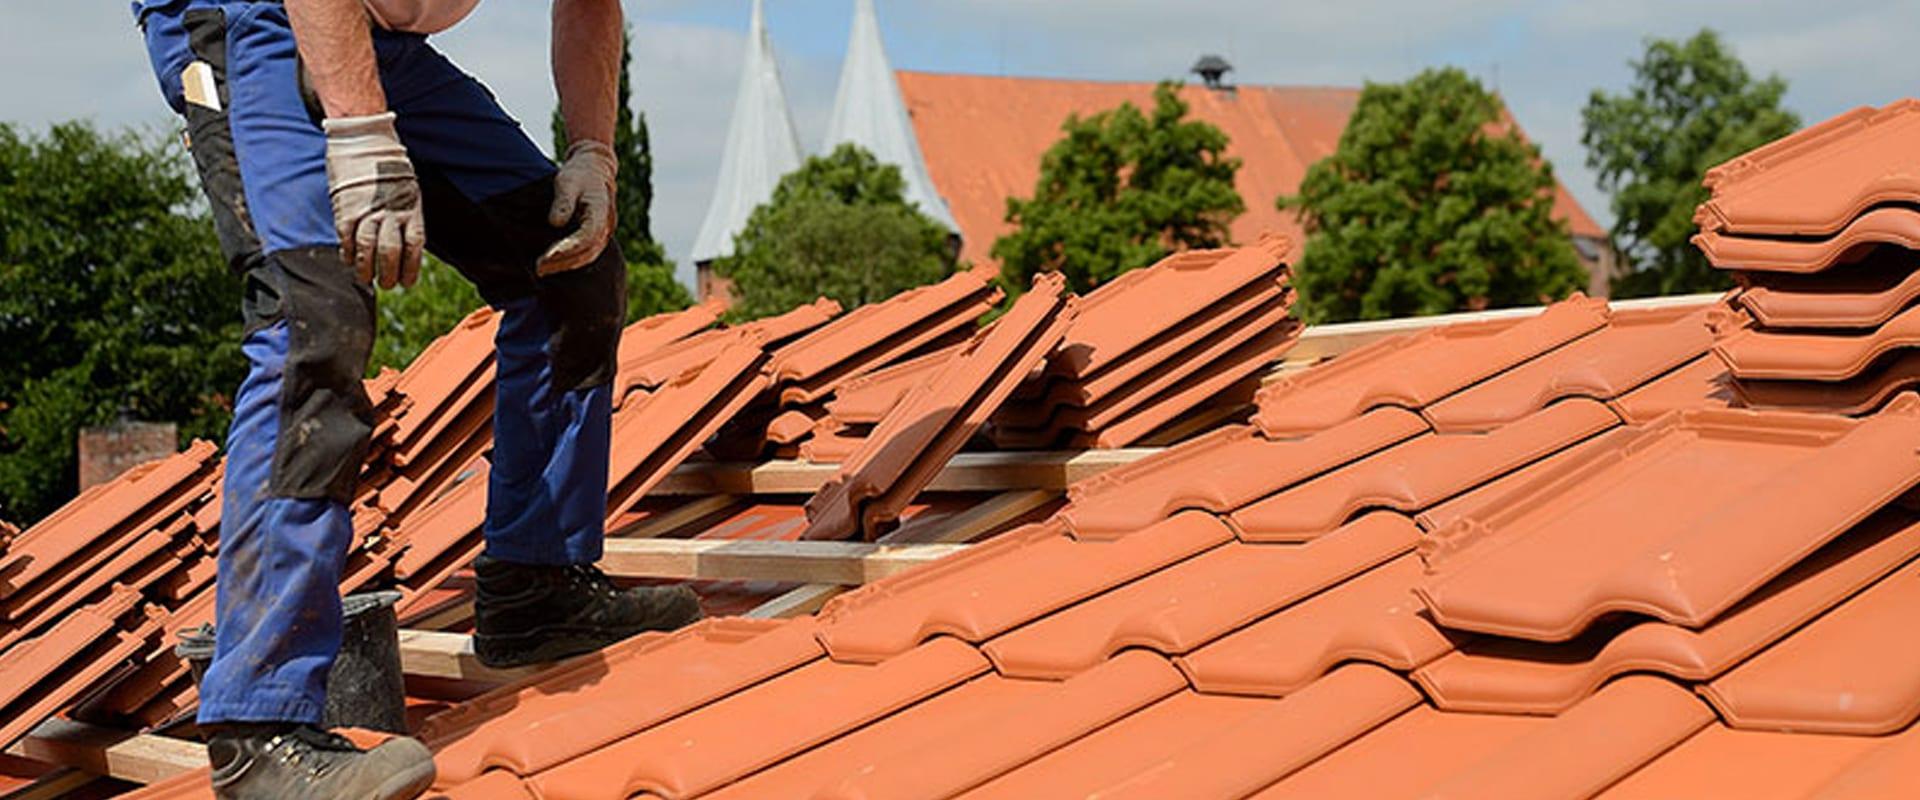 roof leak fix Sydney